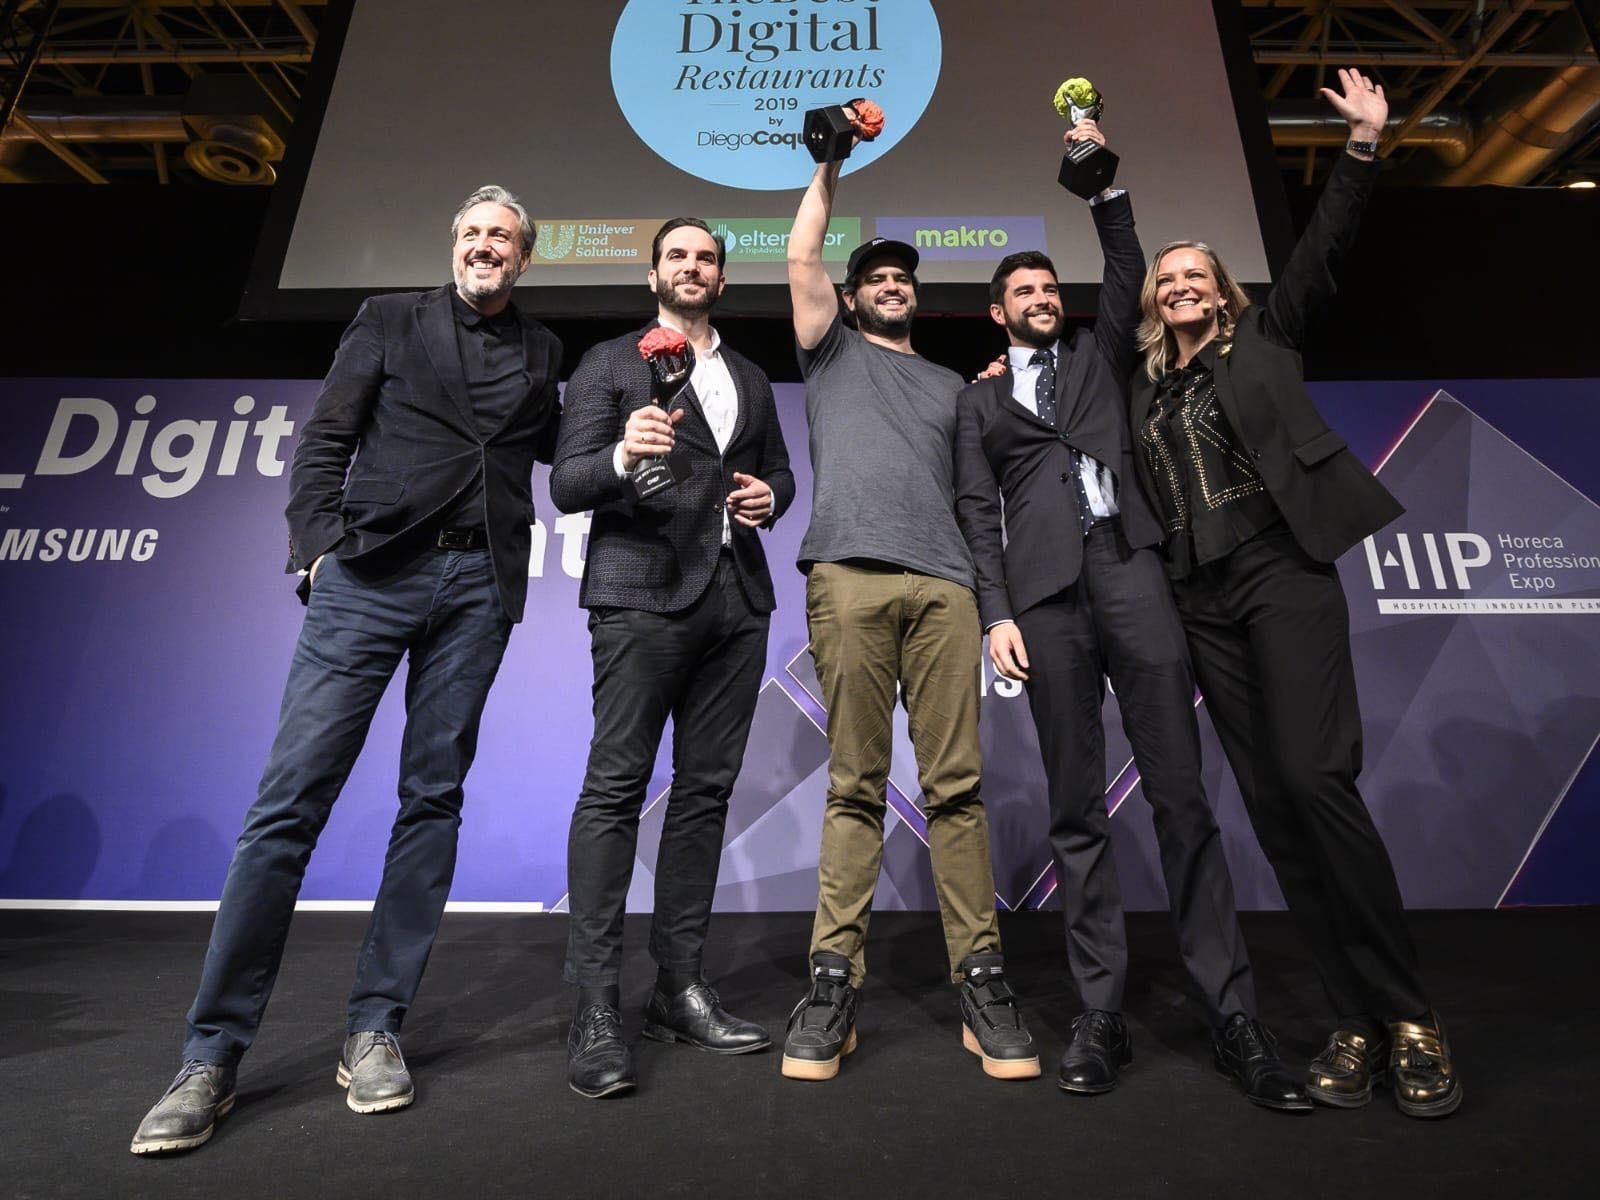 Mario Sandoval The Best Digital Chef 2019